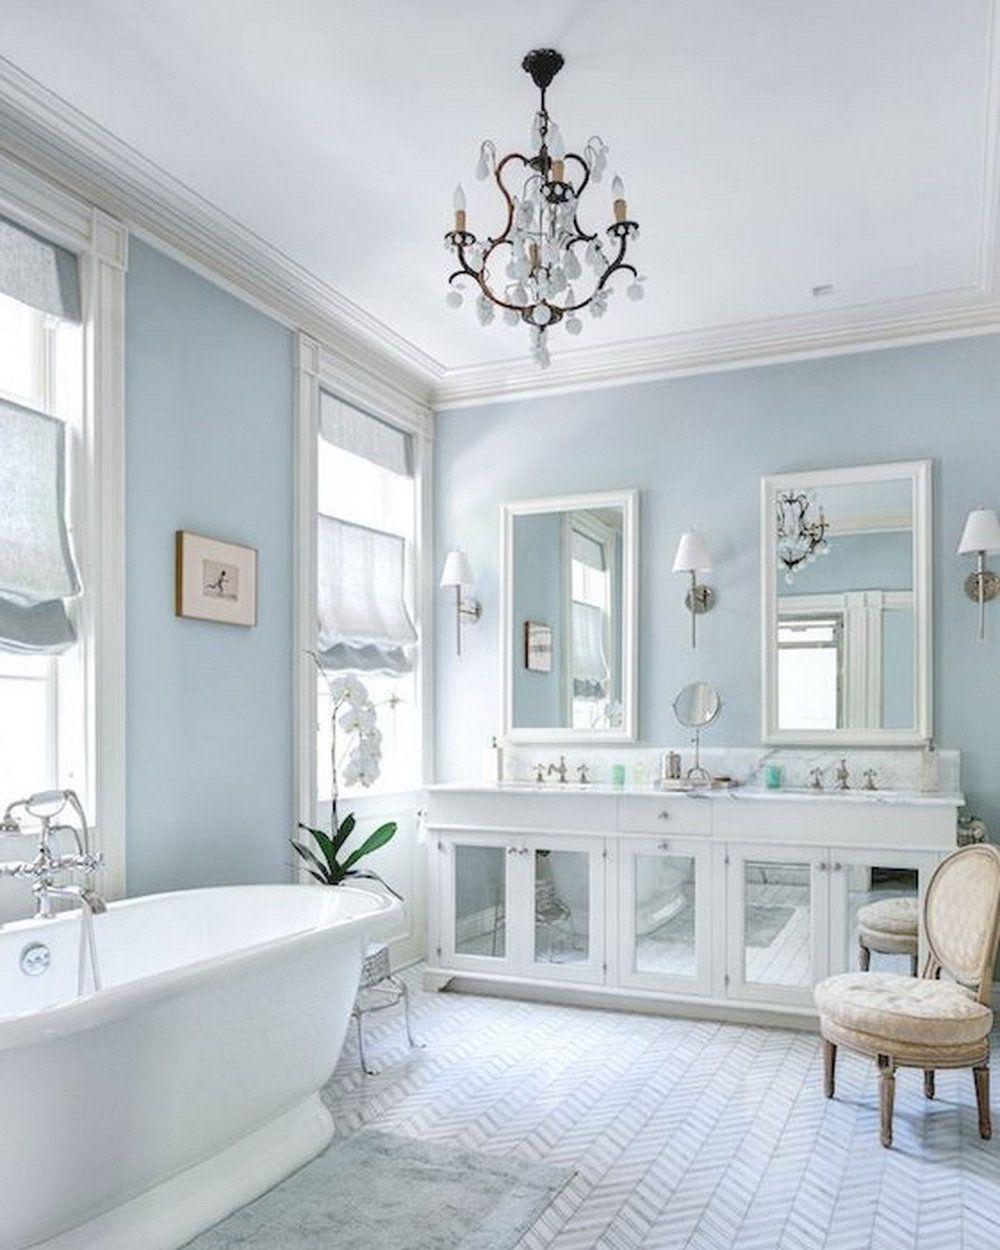 12 Luxurious Bathroom Design Ideas | French vanity, Blue bath and ...